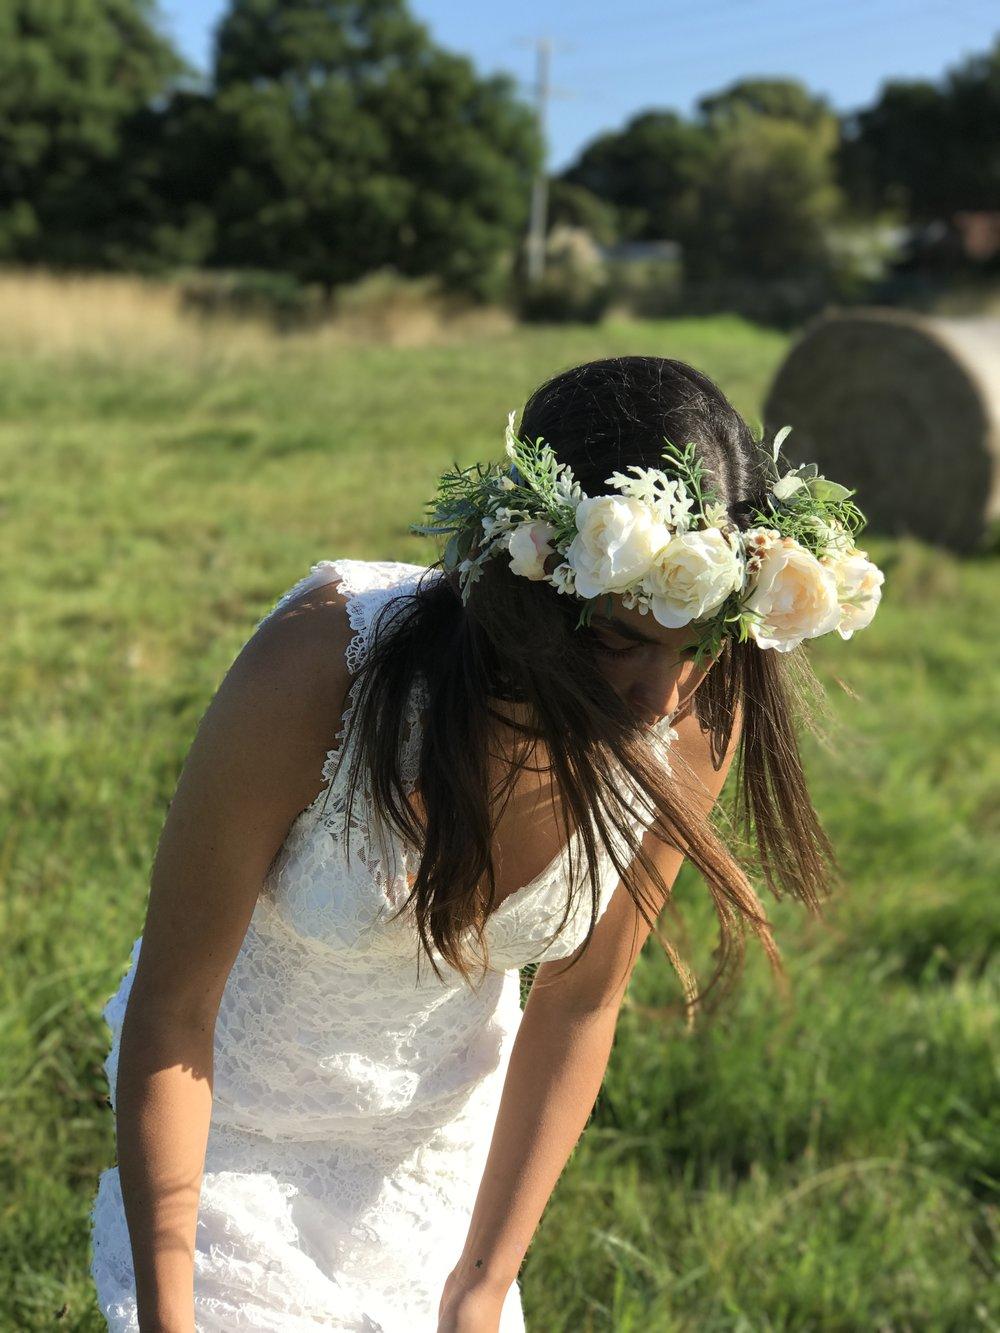 JAMIE DRESSED IN A BEAUTIFUL VINTAGE LACE DRESS // HARRIET CROWN